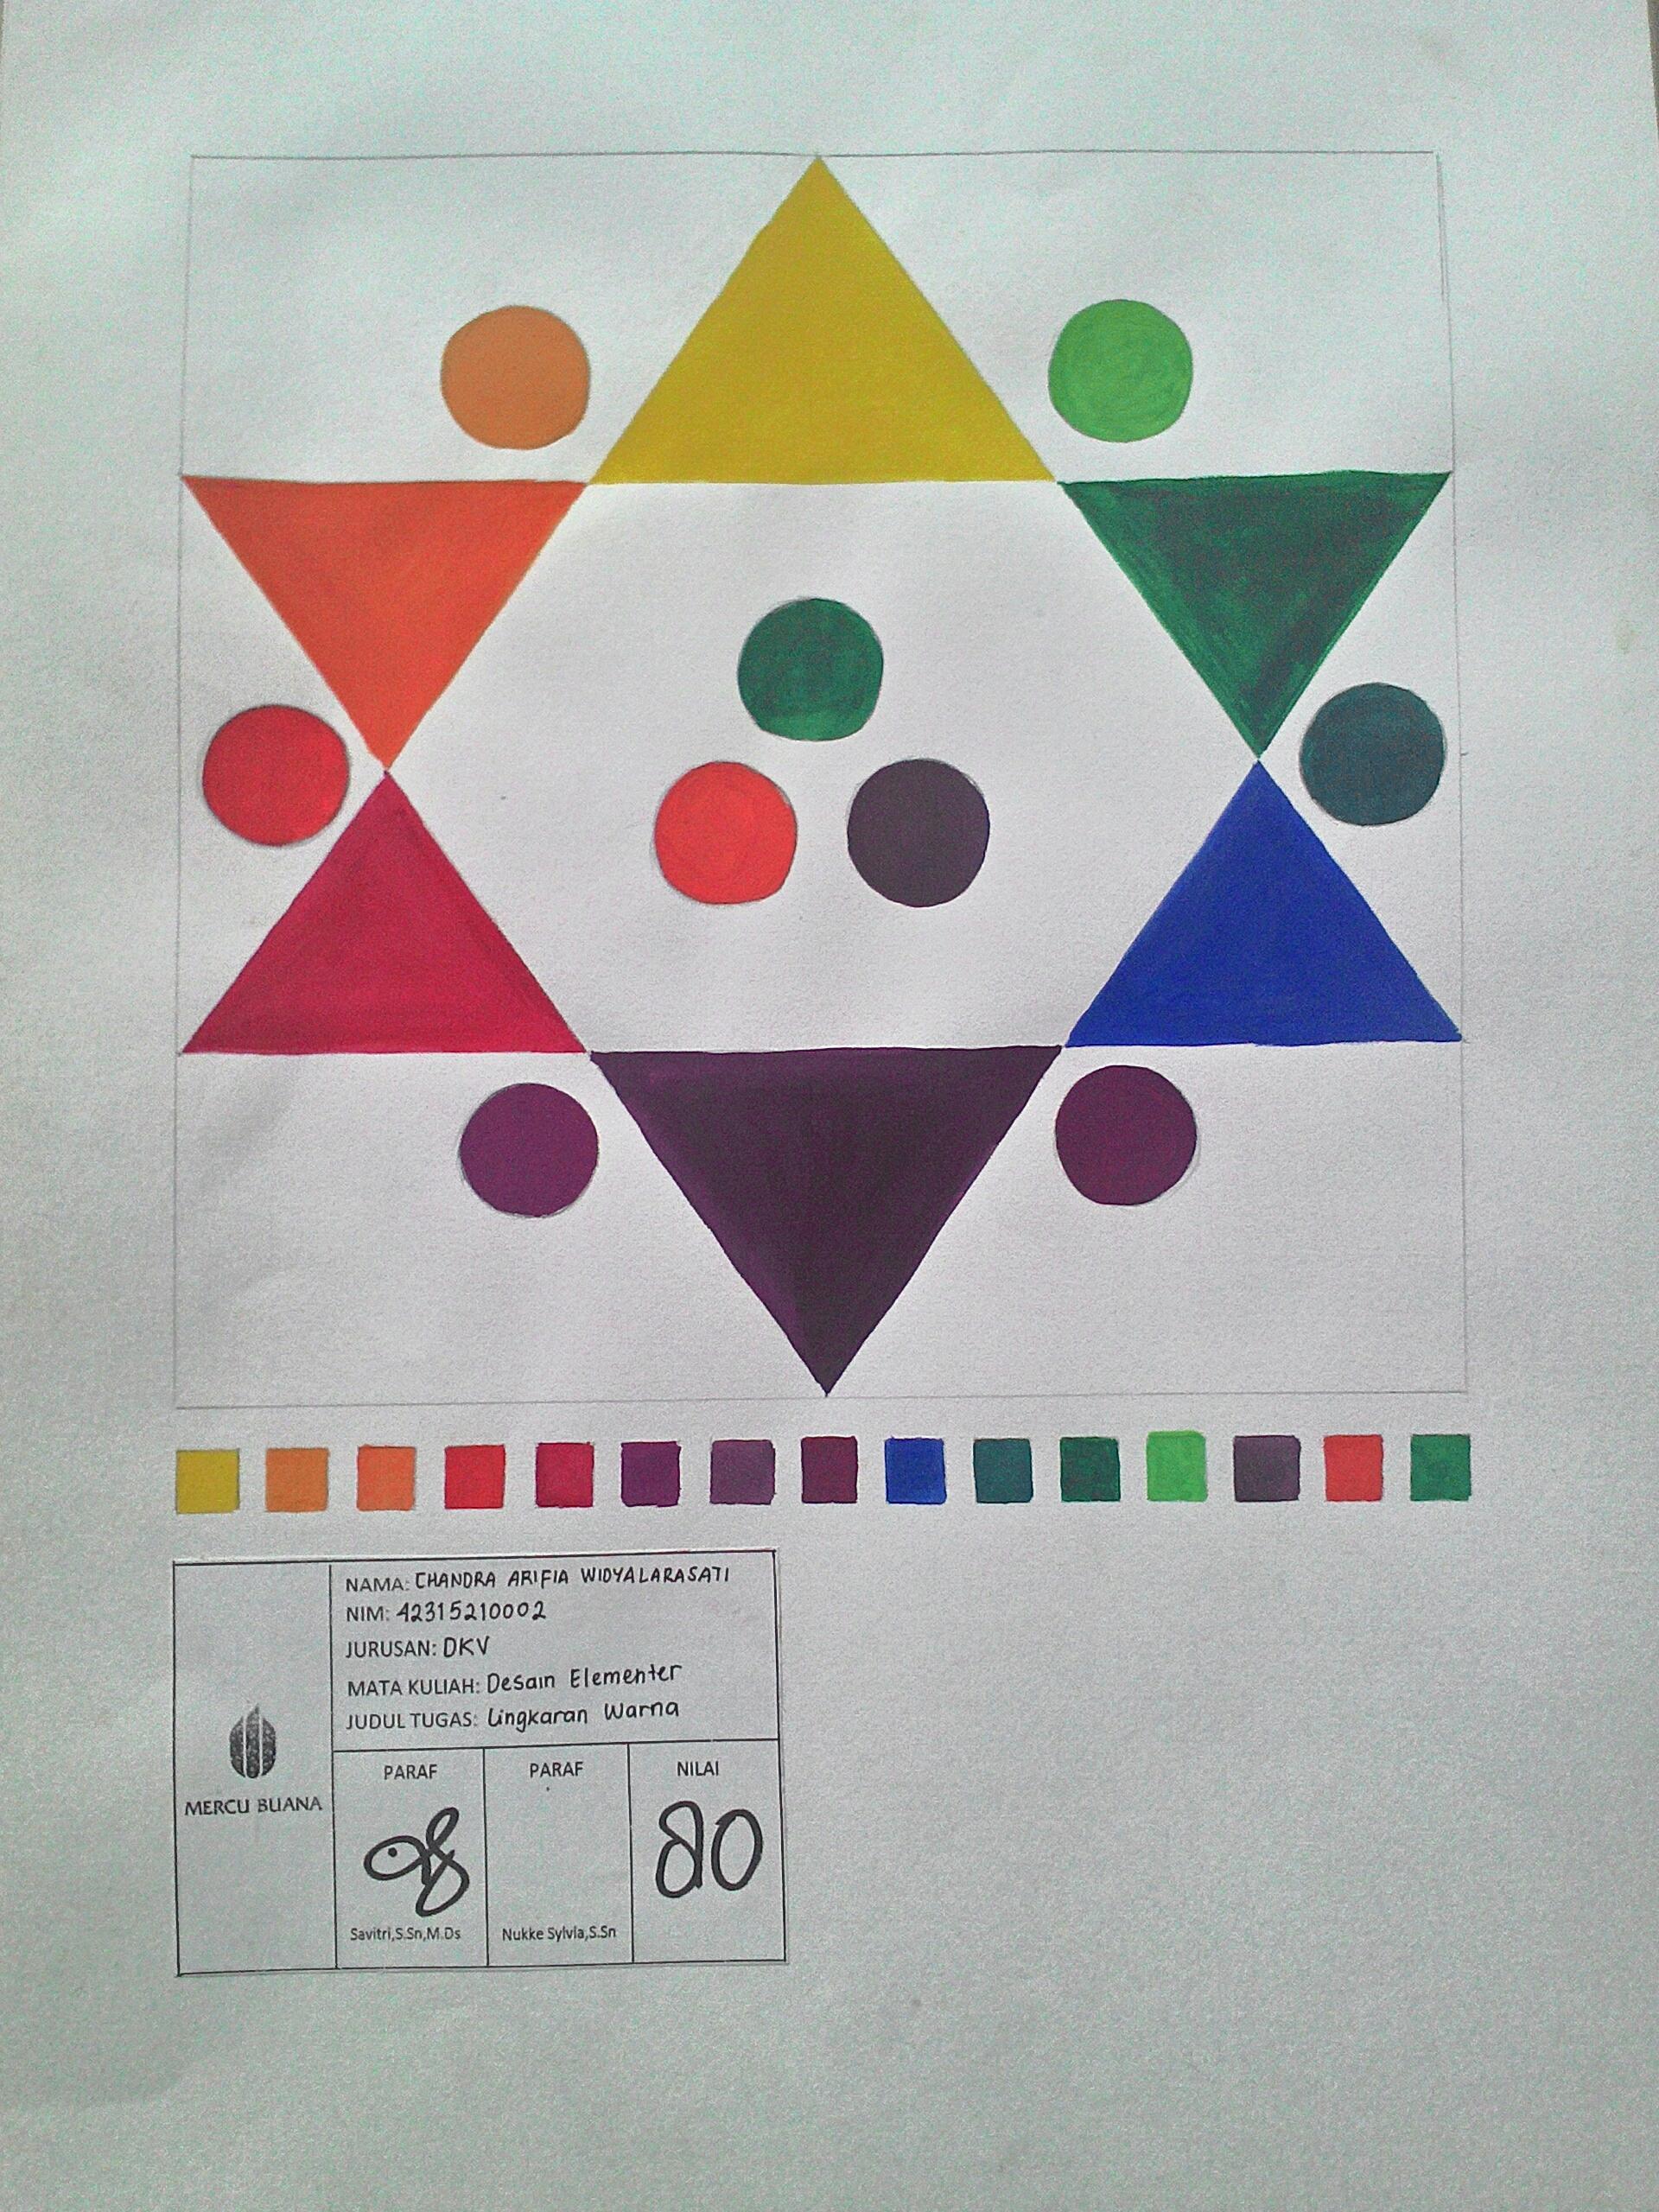 Lingkaran Warna : lingkaran, warna, Lingkaran, Warna, Portfolio, Chandra